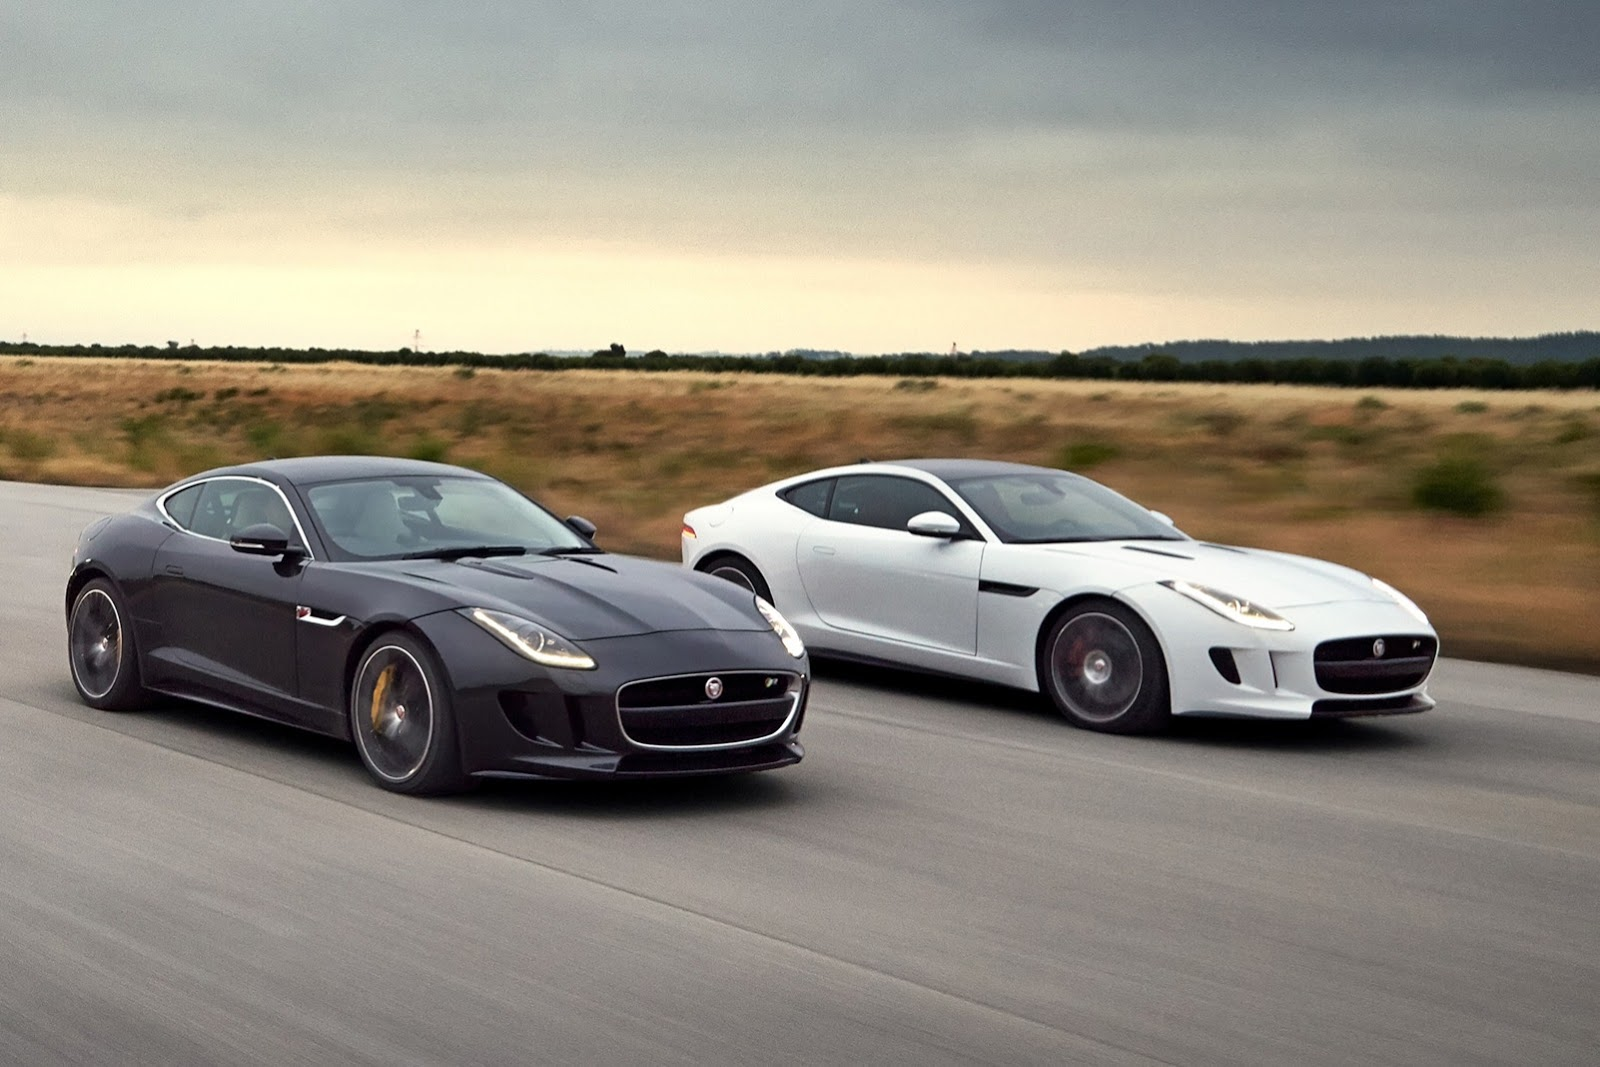 jaguar f type coupe revealed gets 550 hp engine video autoevolution. Black Bedroom Furniture Sets. Home Design Ideas